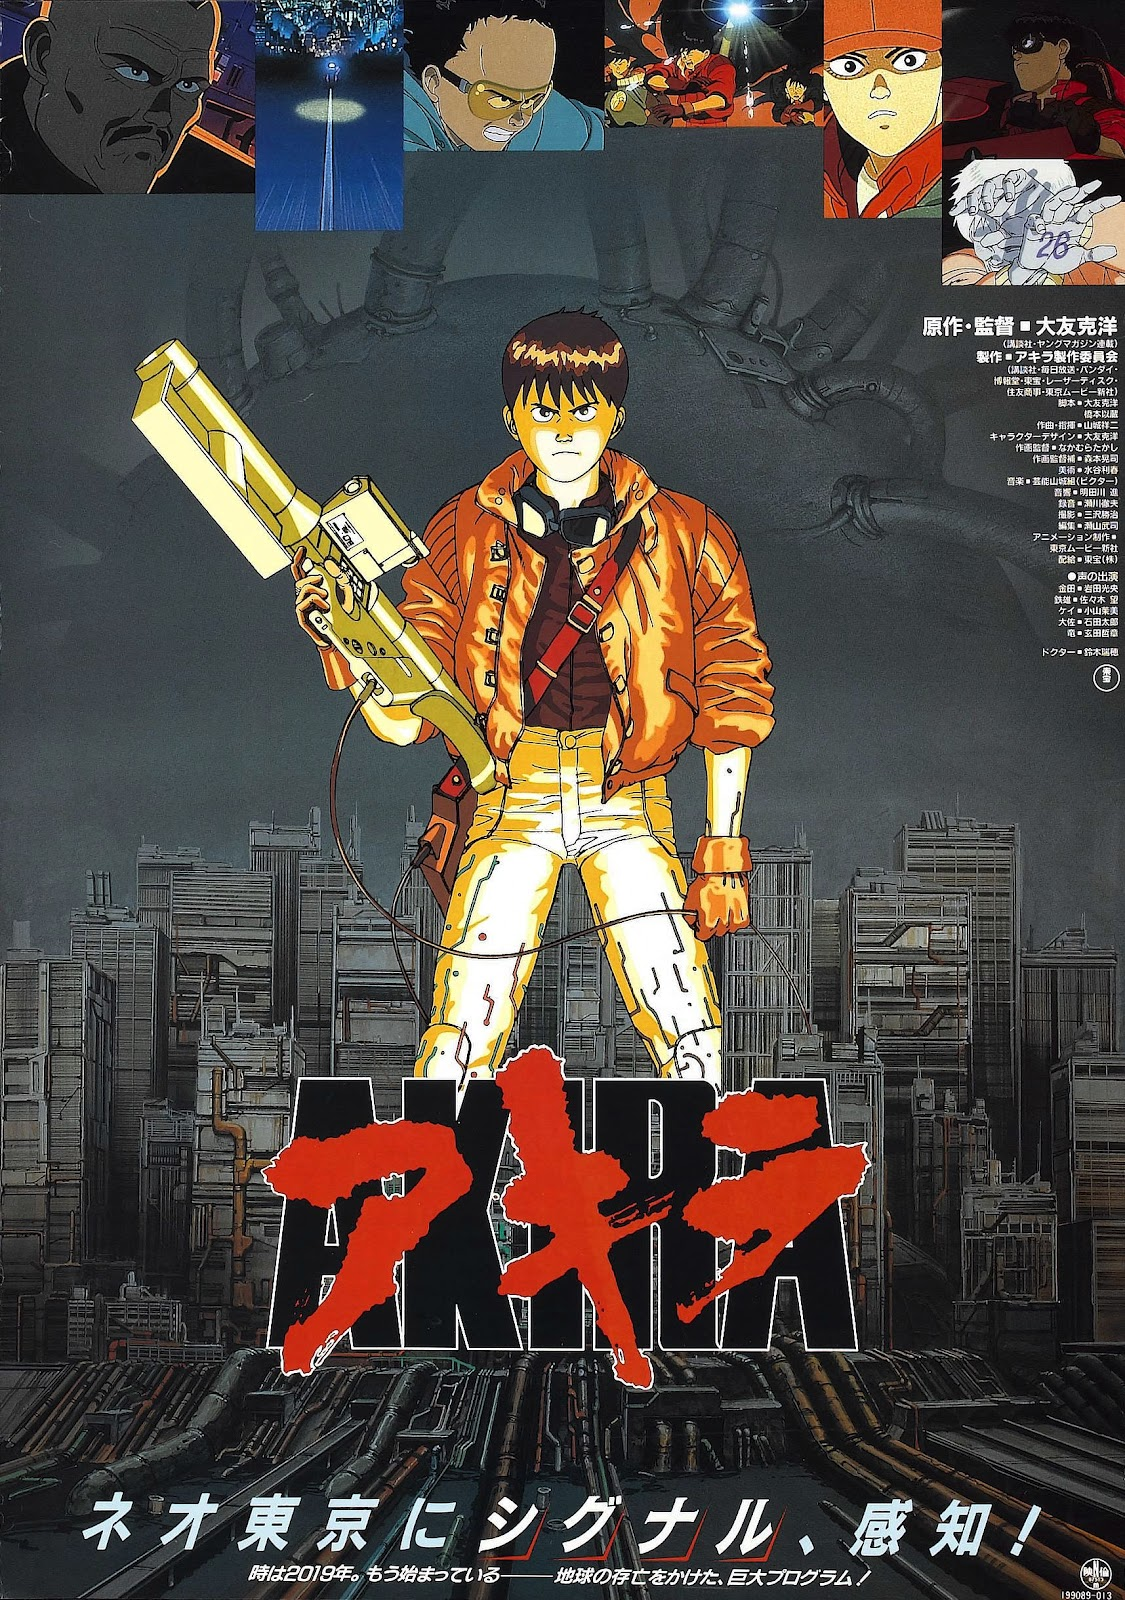 Scott S Film Watch Retro Duo Anime Edition Akira 1988 Ninja Scroll 1993